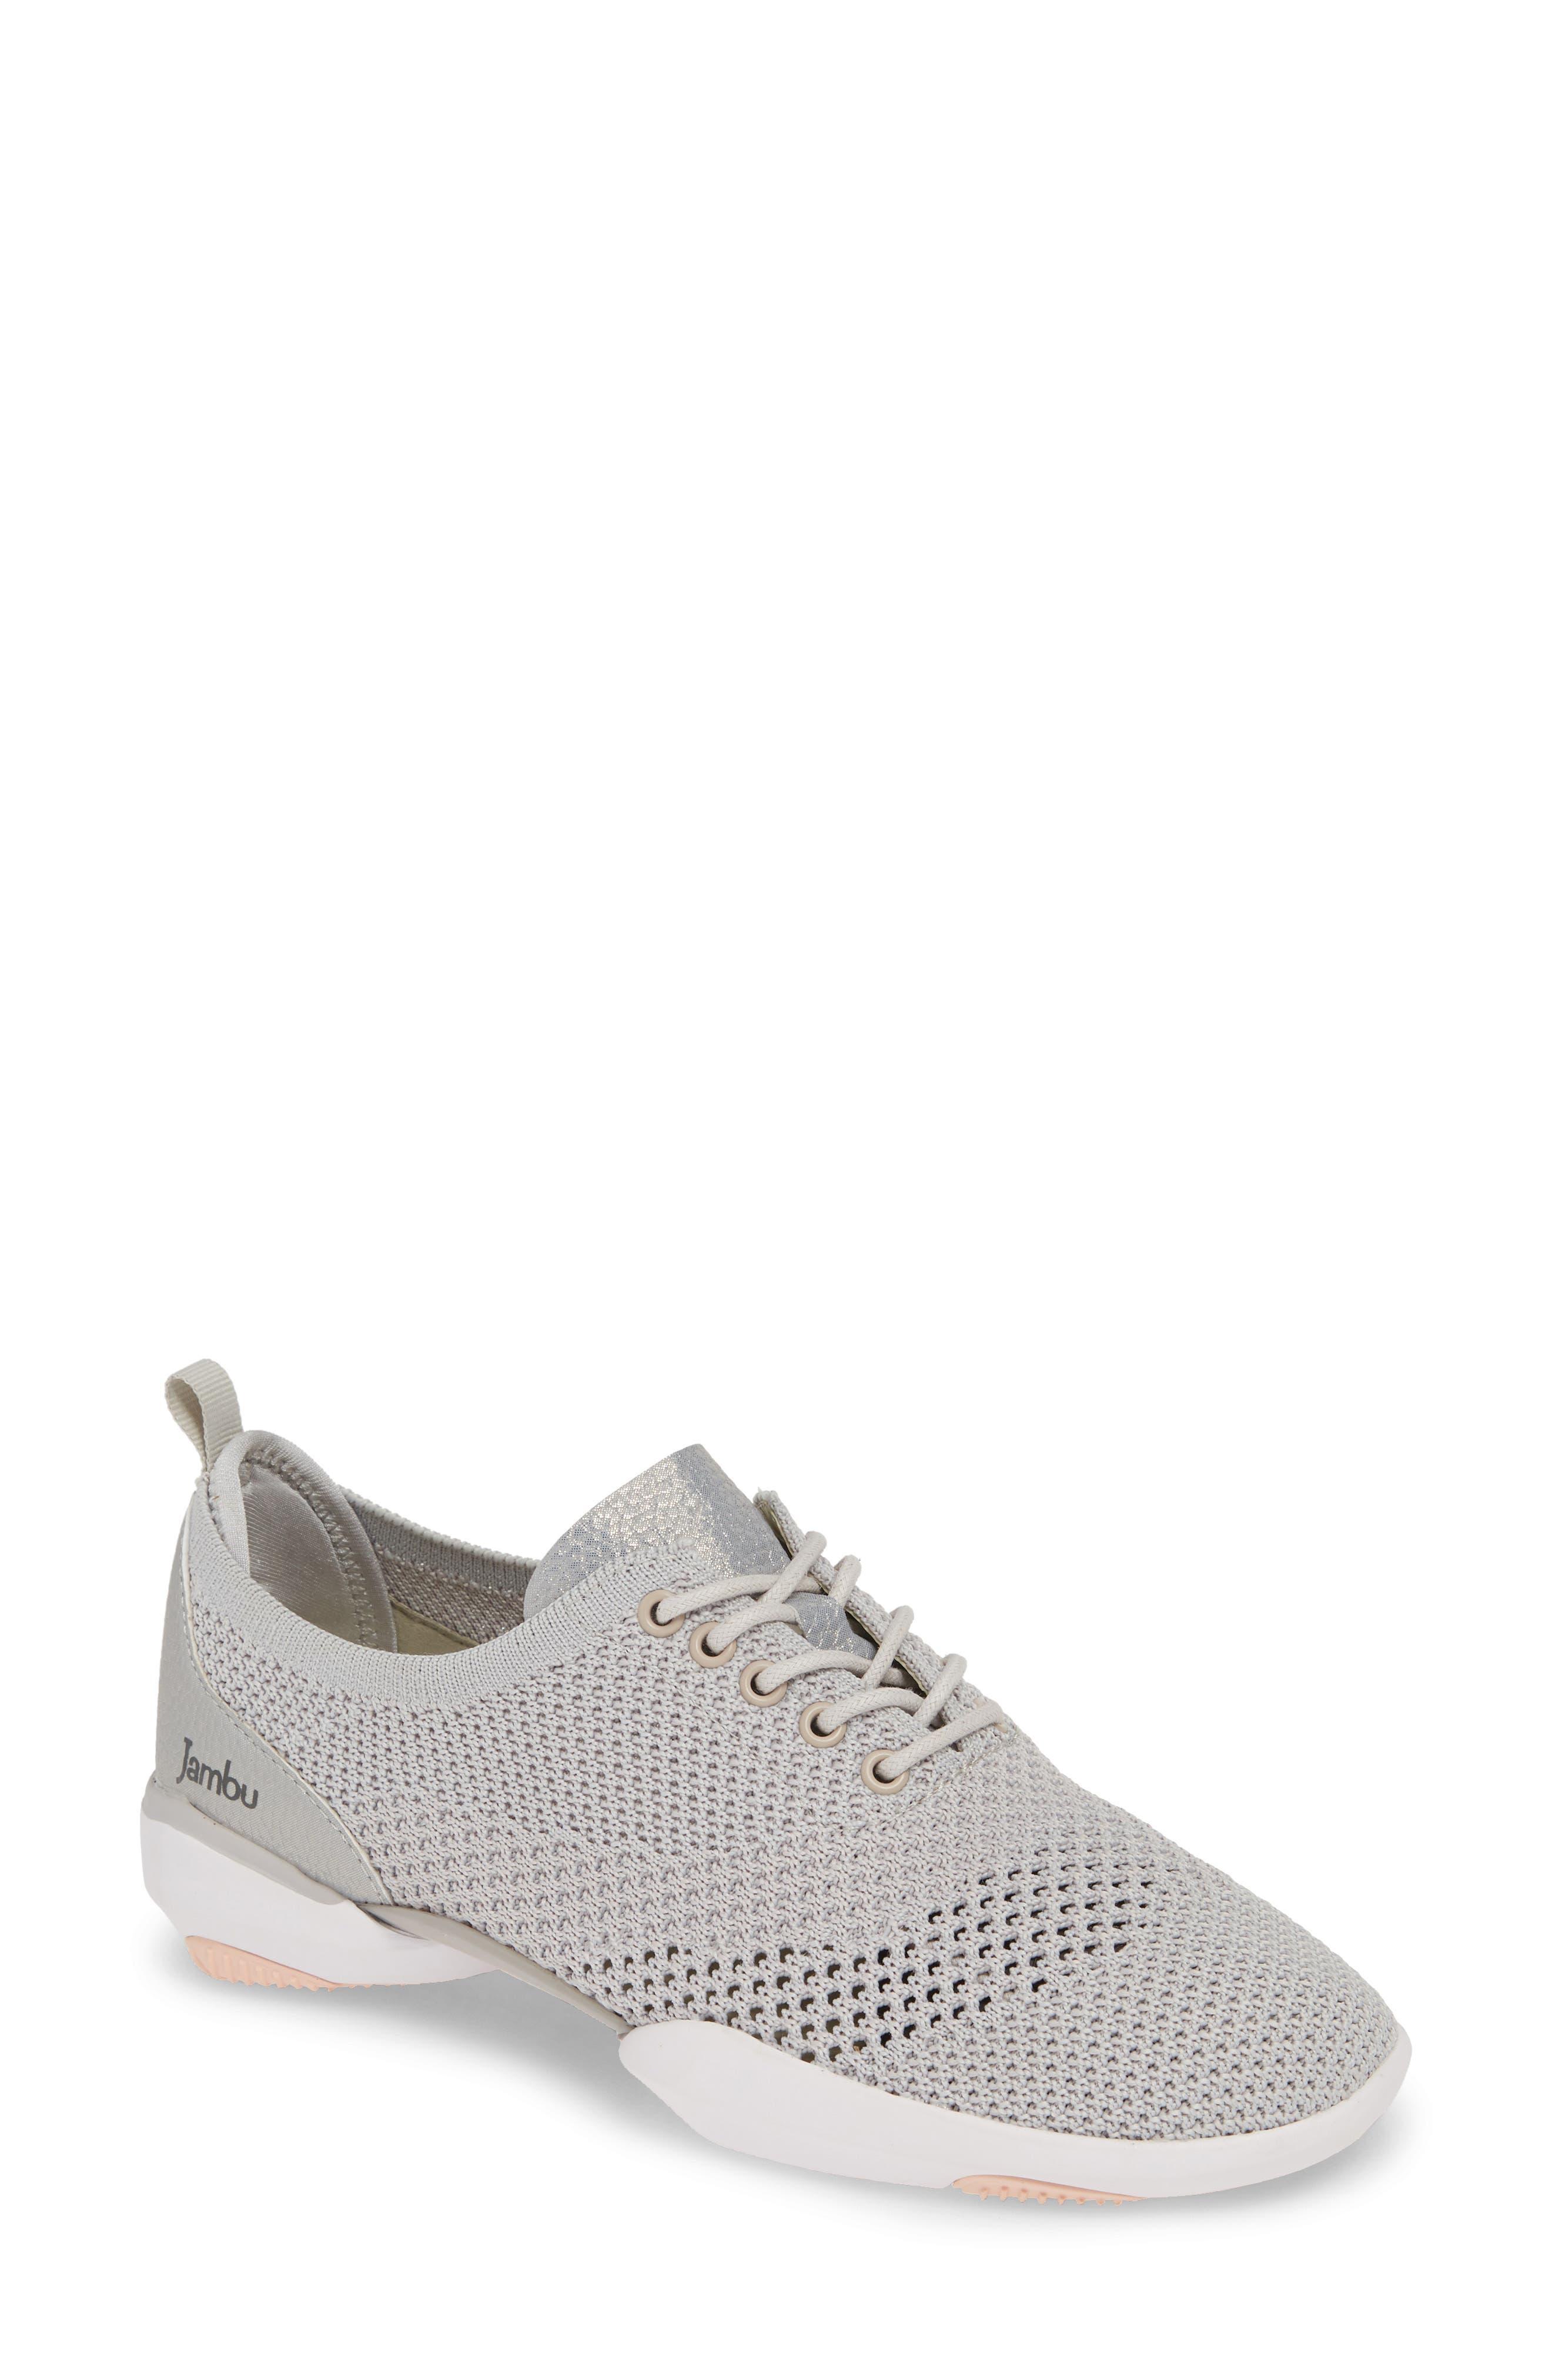 Jambu Mango Sneaker, Grey